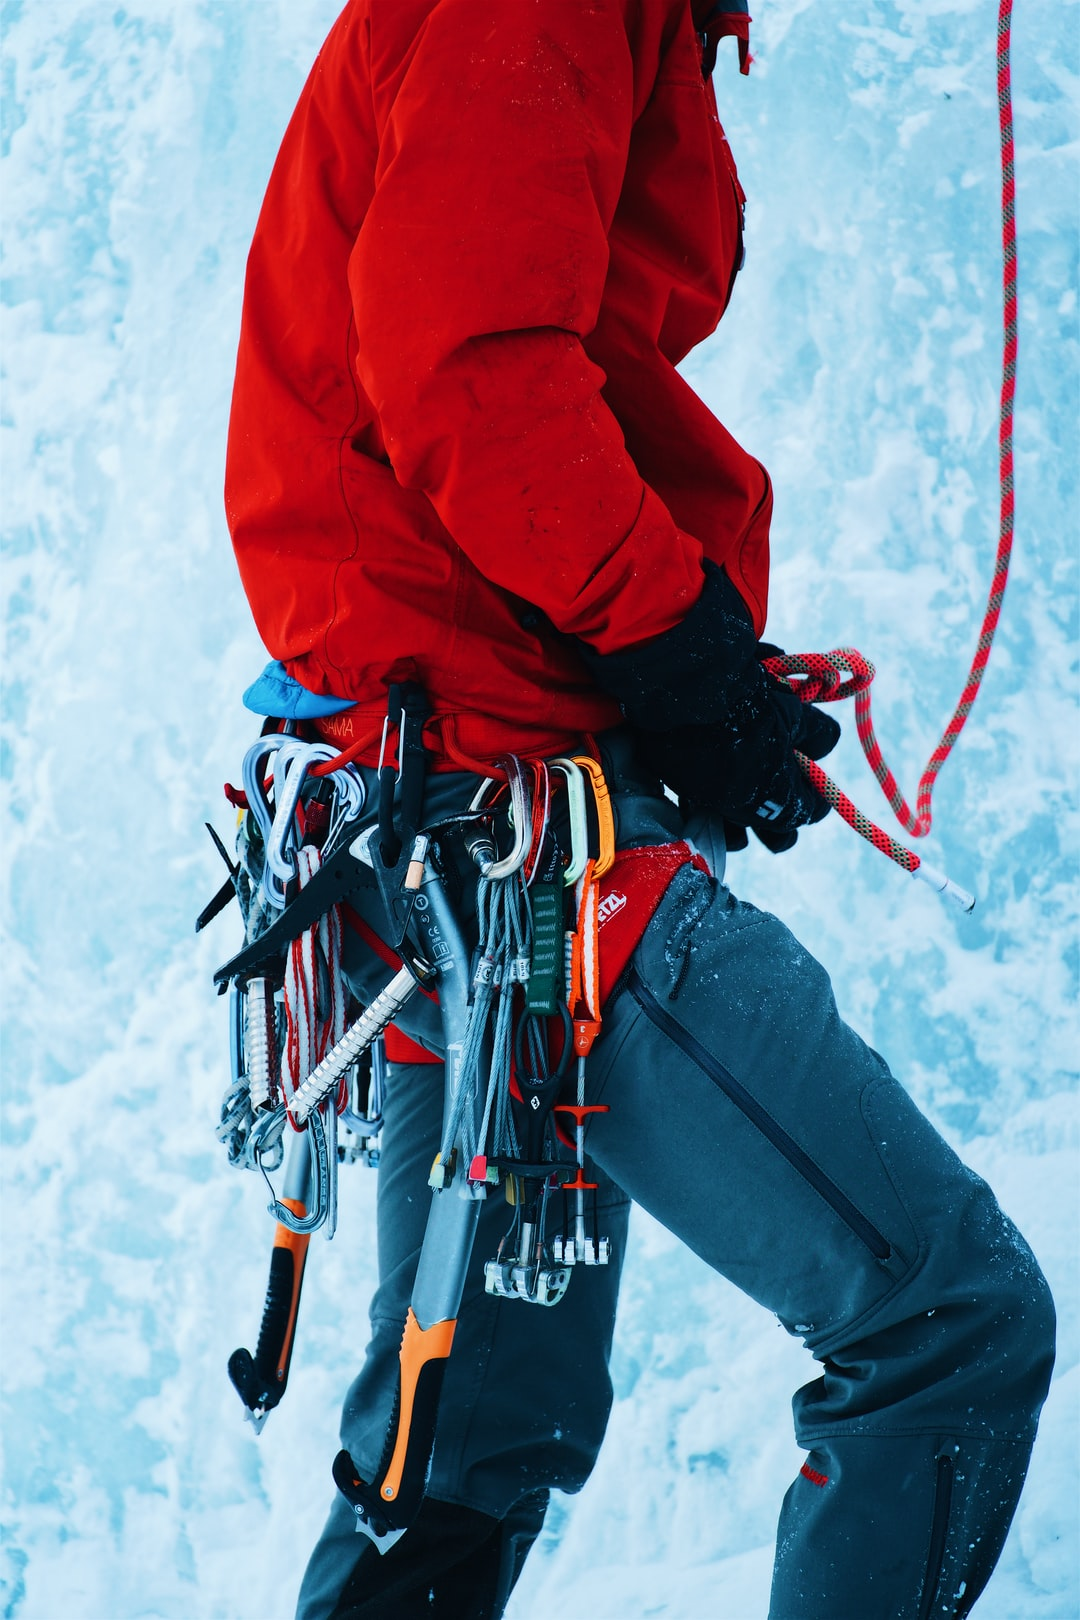 Mountain climber at Bridal Veil Falls